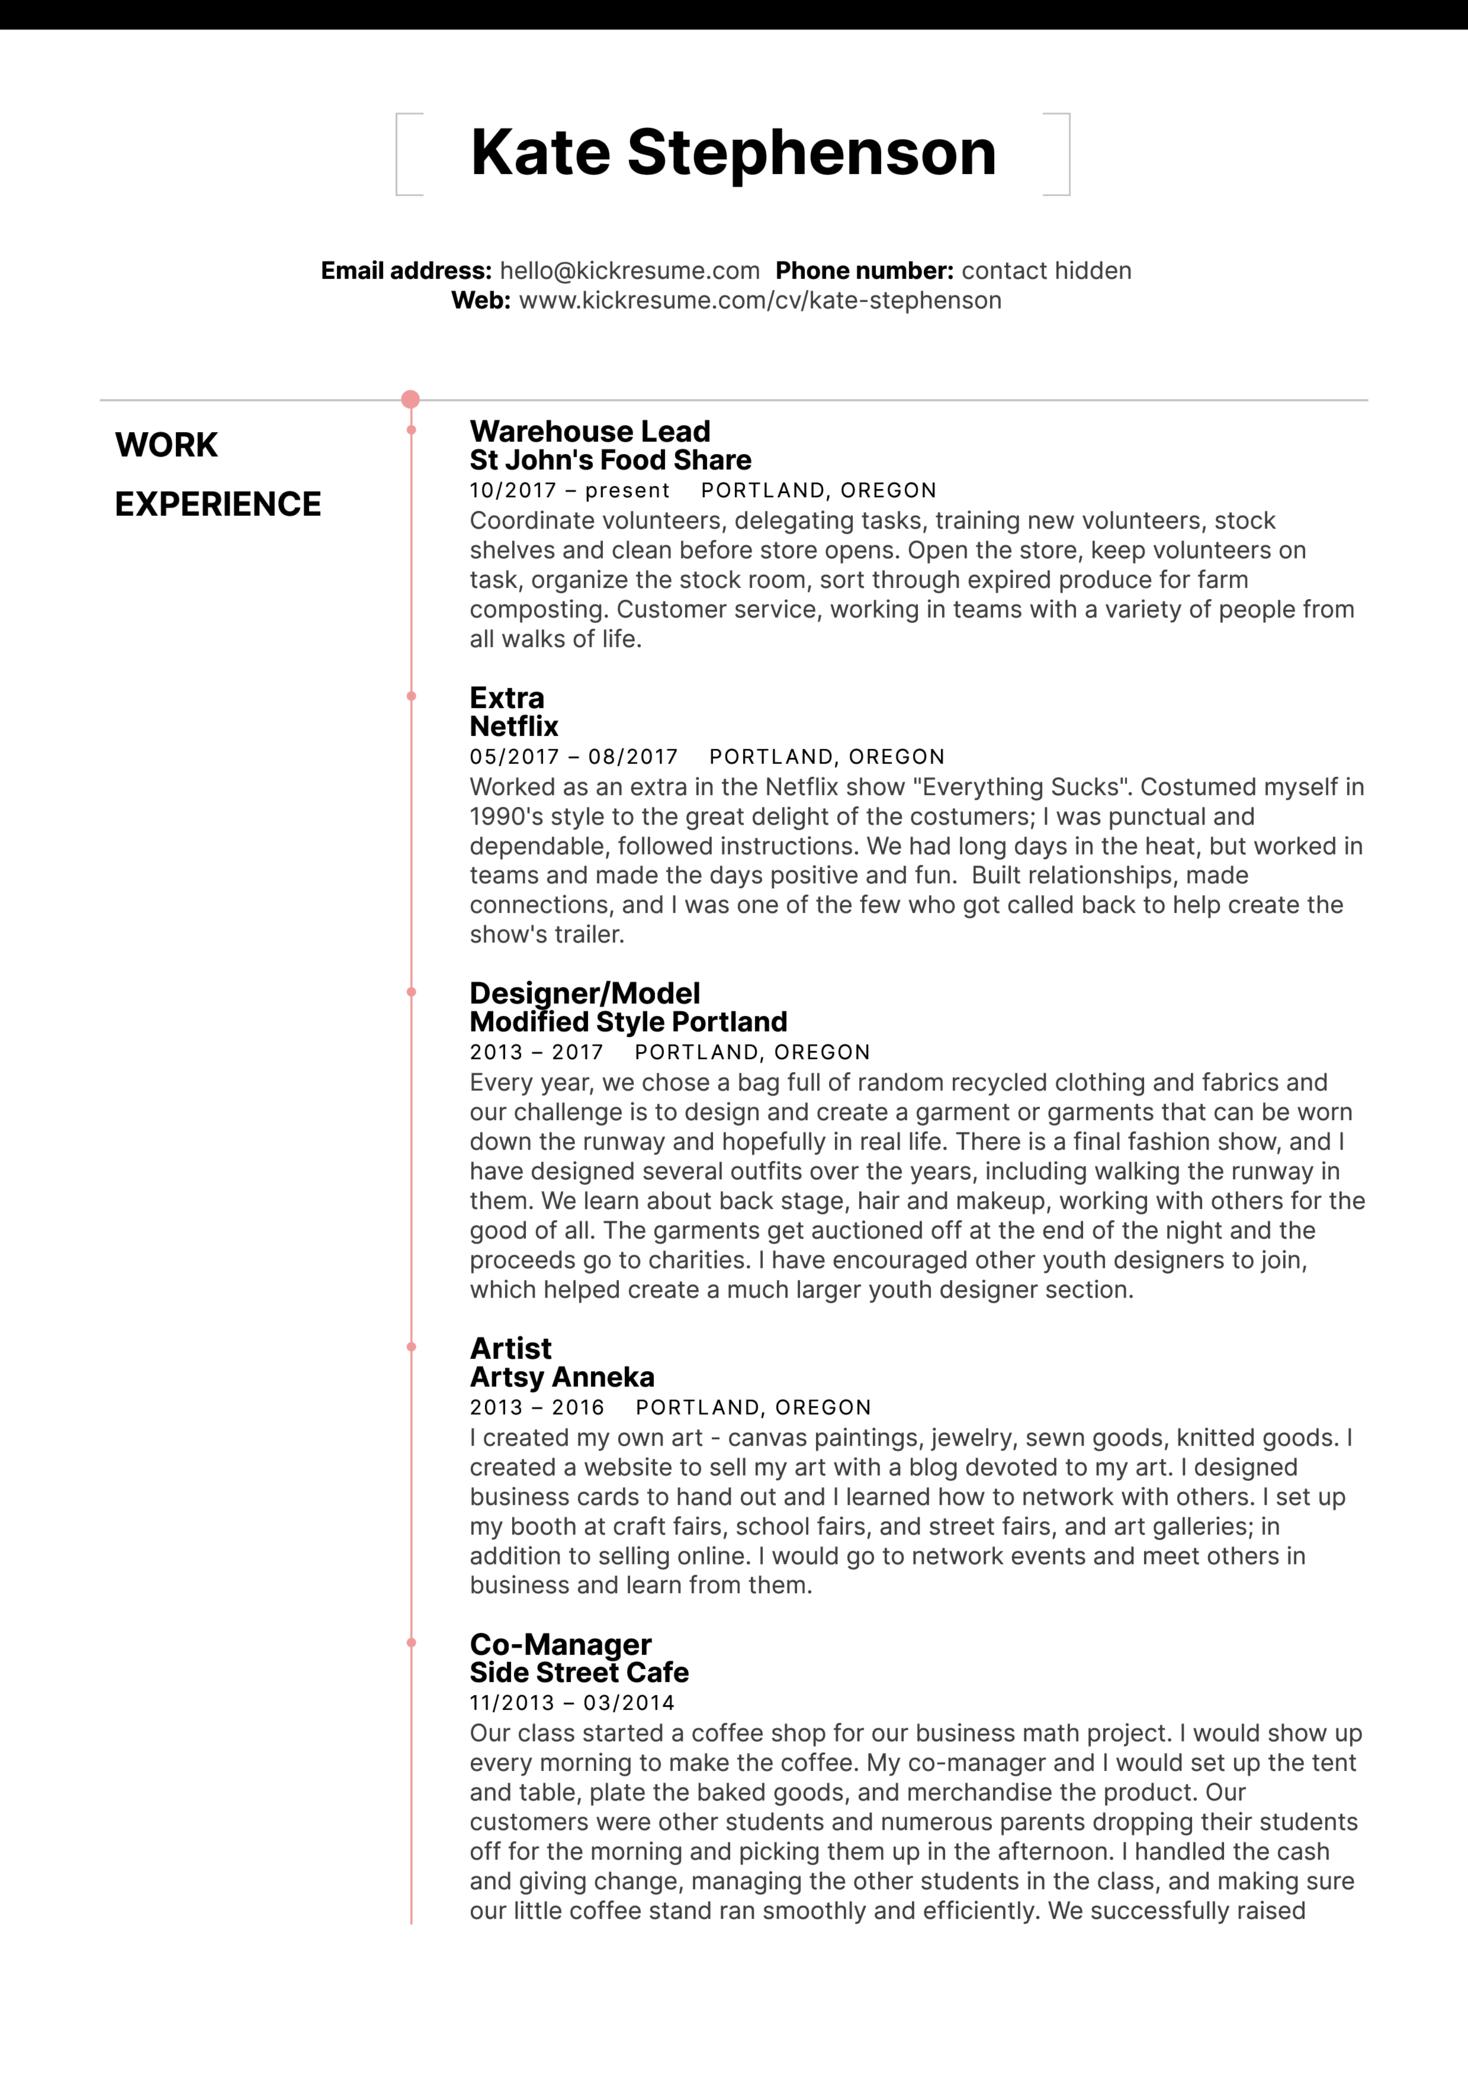 Starbucks Barista Resume Sample (parte 1)